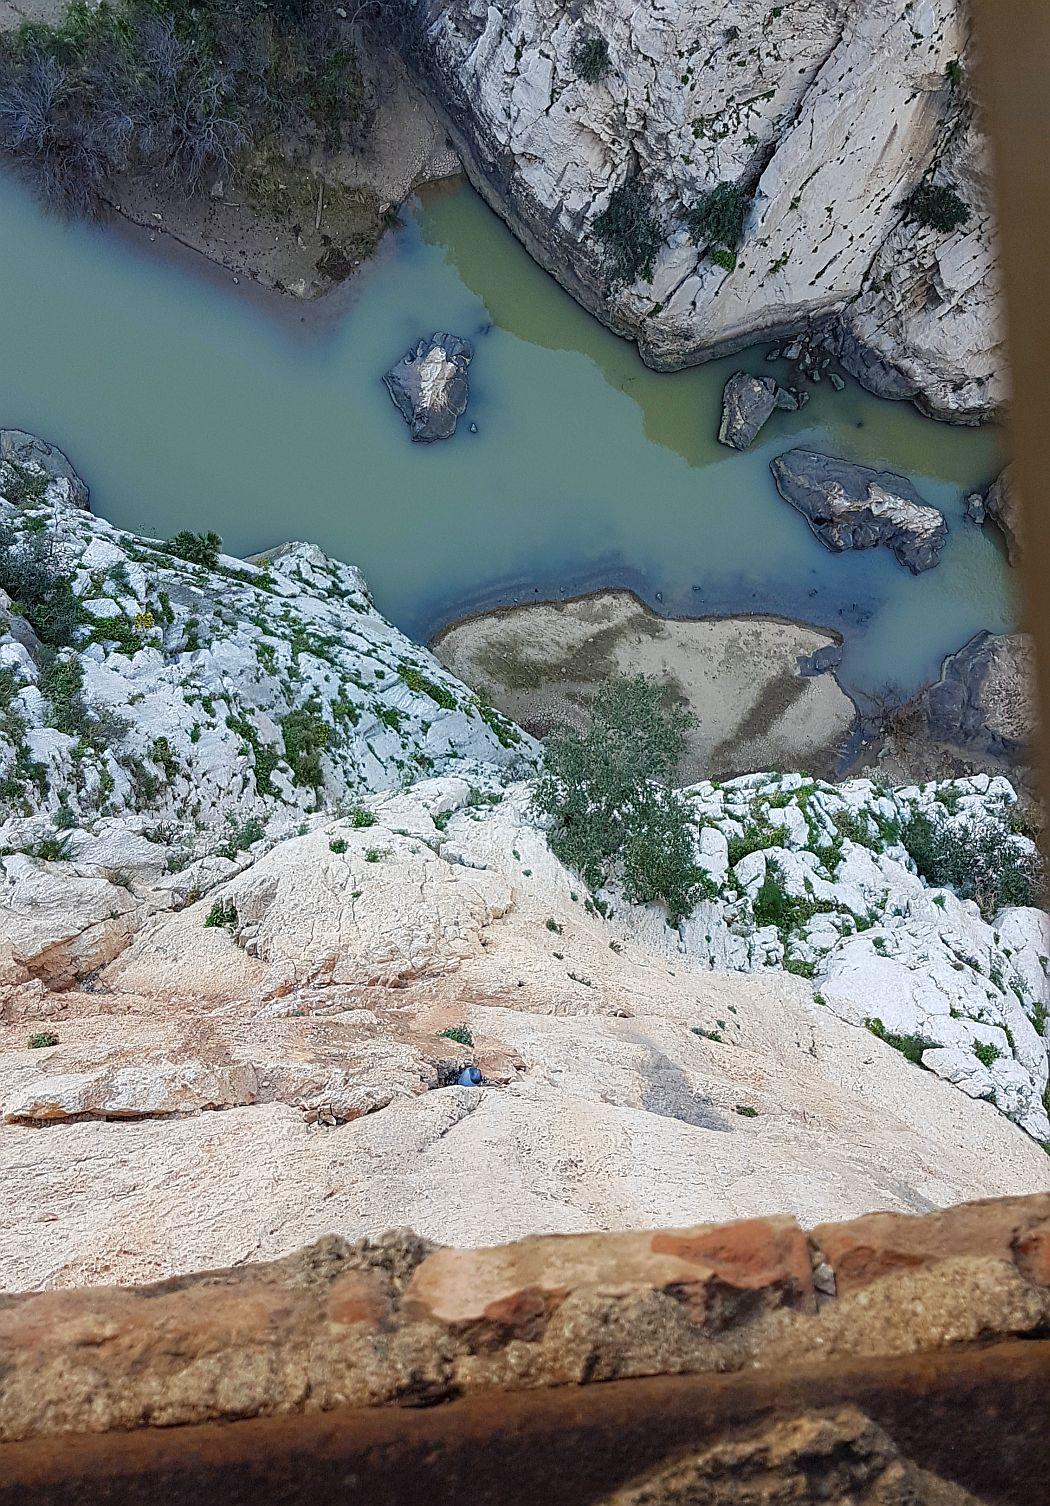 Caminito del Rey - widok w dół